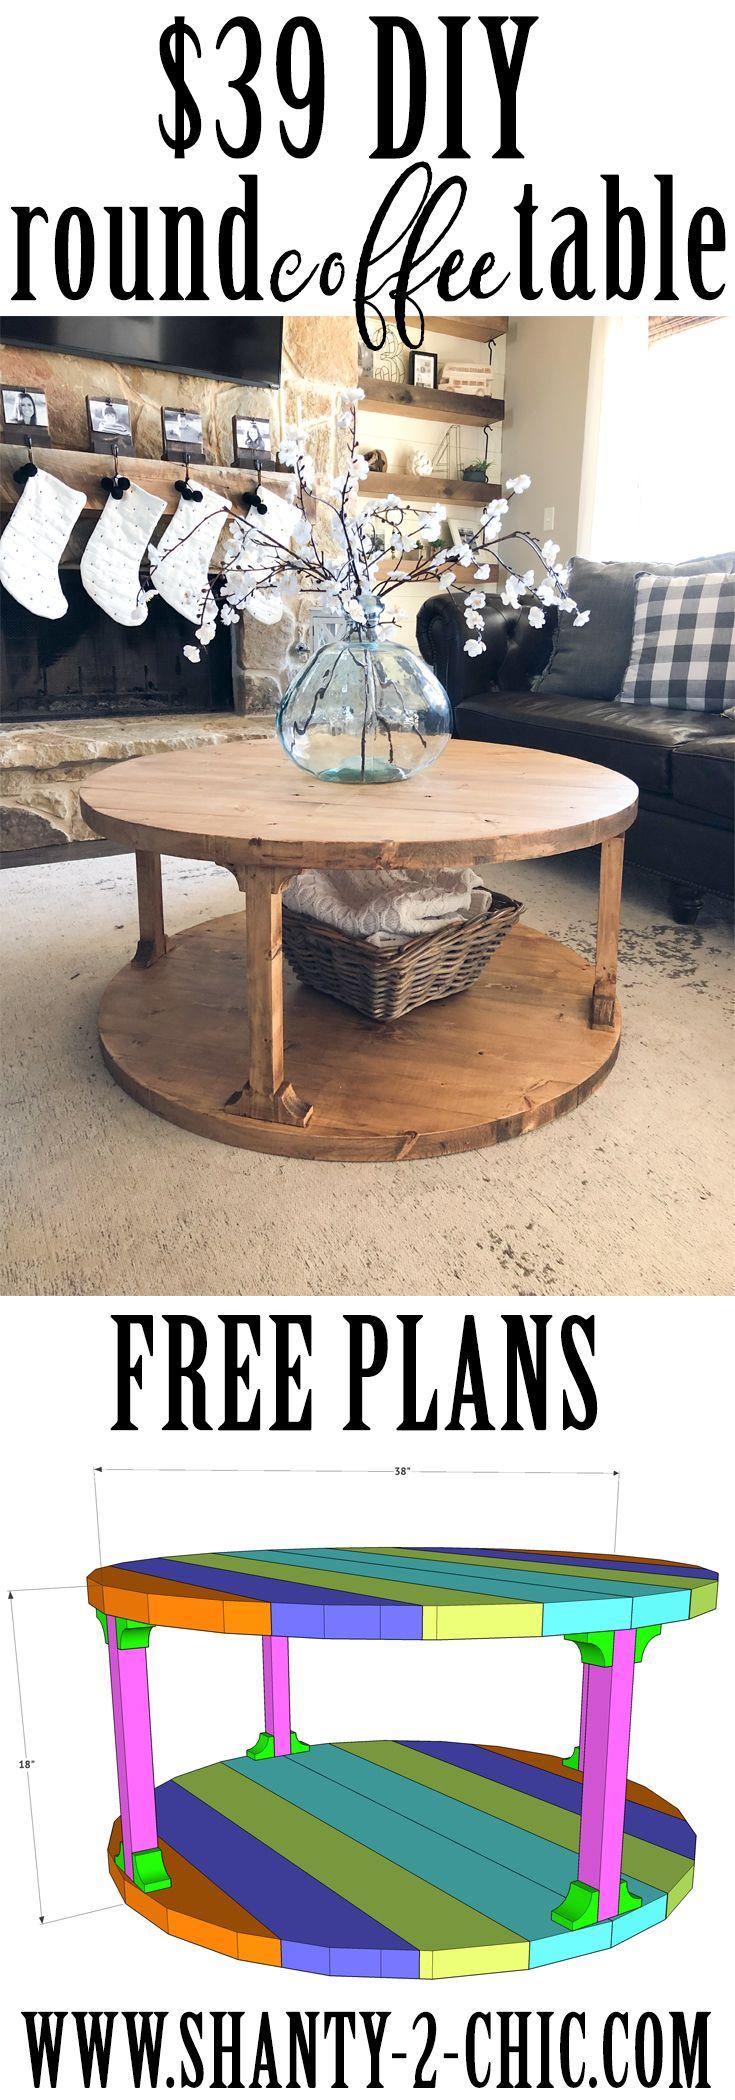 Diy Round Coffee Table Round Coffee Table Diy Diy Coffee Table Coffee Table Farmhouse [ 2100 x 735 Pixel ]